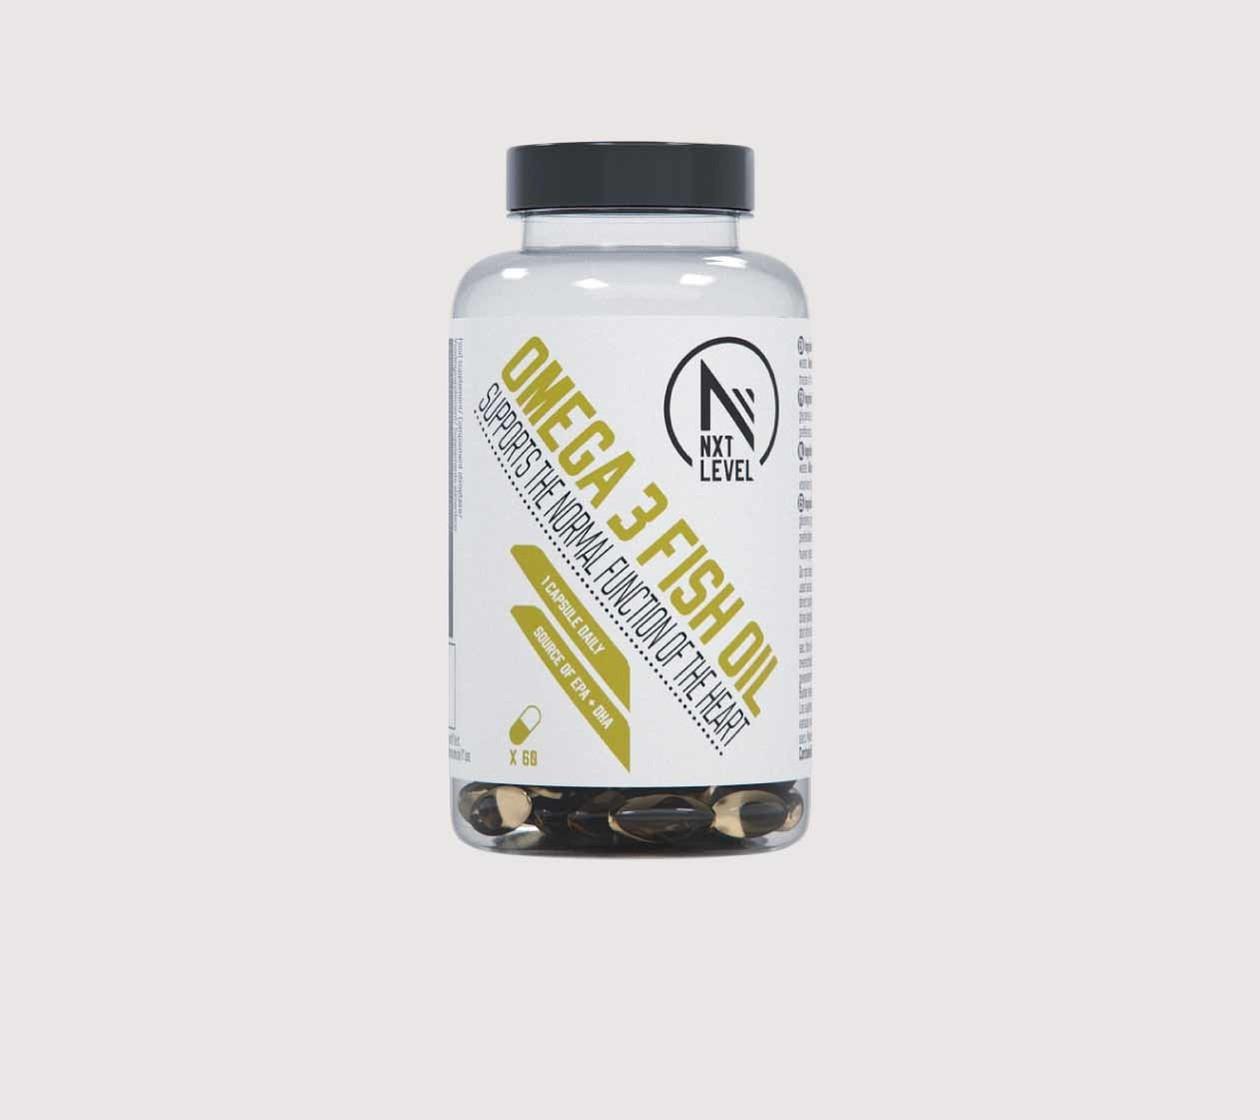 ACEITE OMEGA 3 - 60 cápsulas - 1 al dia